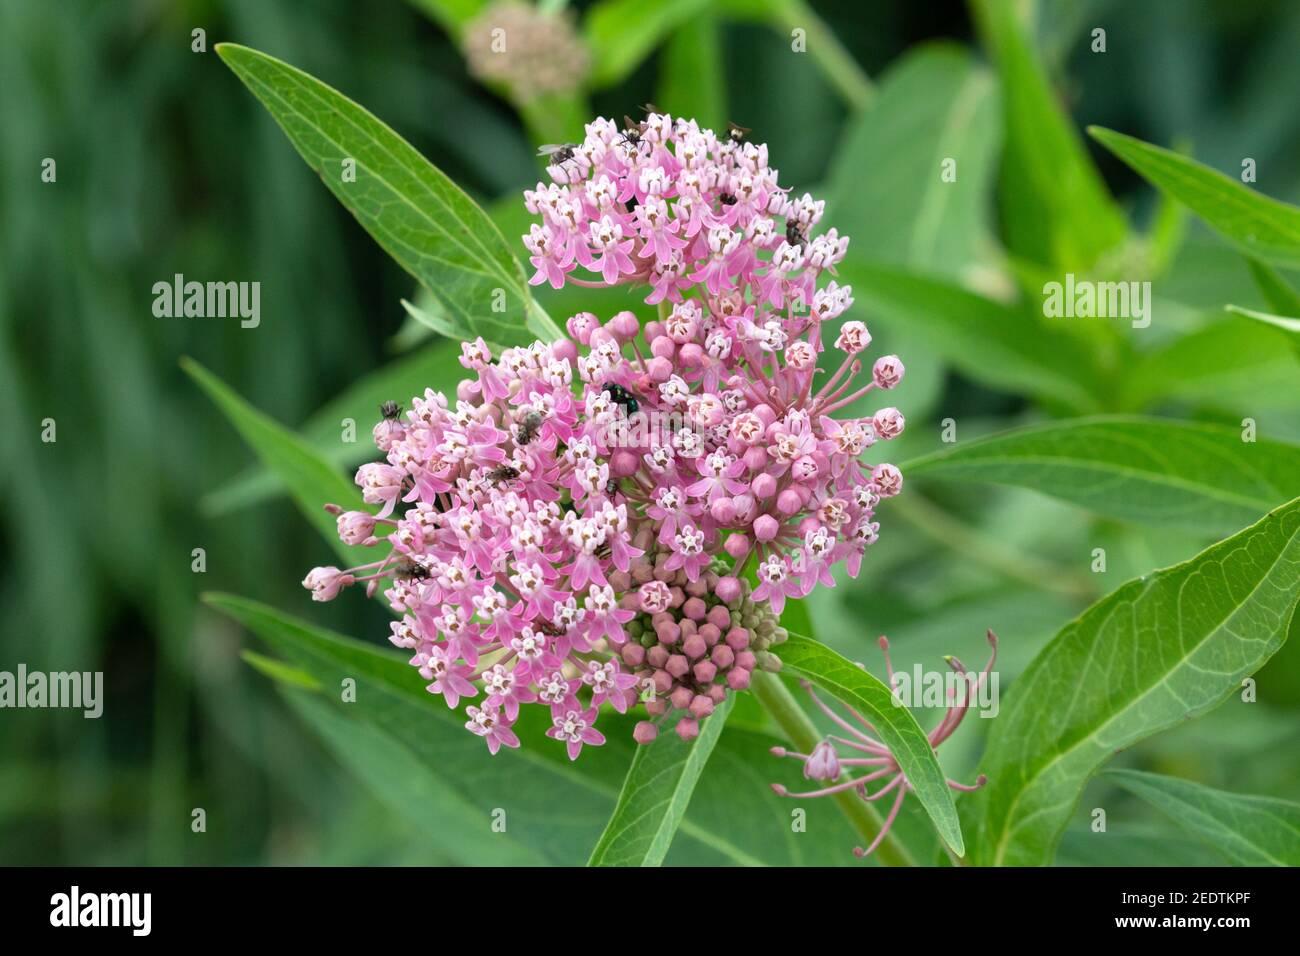 Swamp Milkweed - Asclepias incarnata 20 de julio de 2019 Big Sioux Recreation Area, Dakota del Sur Foto de stock